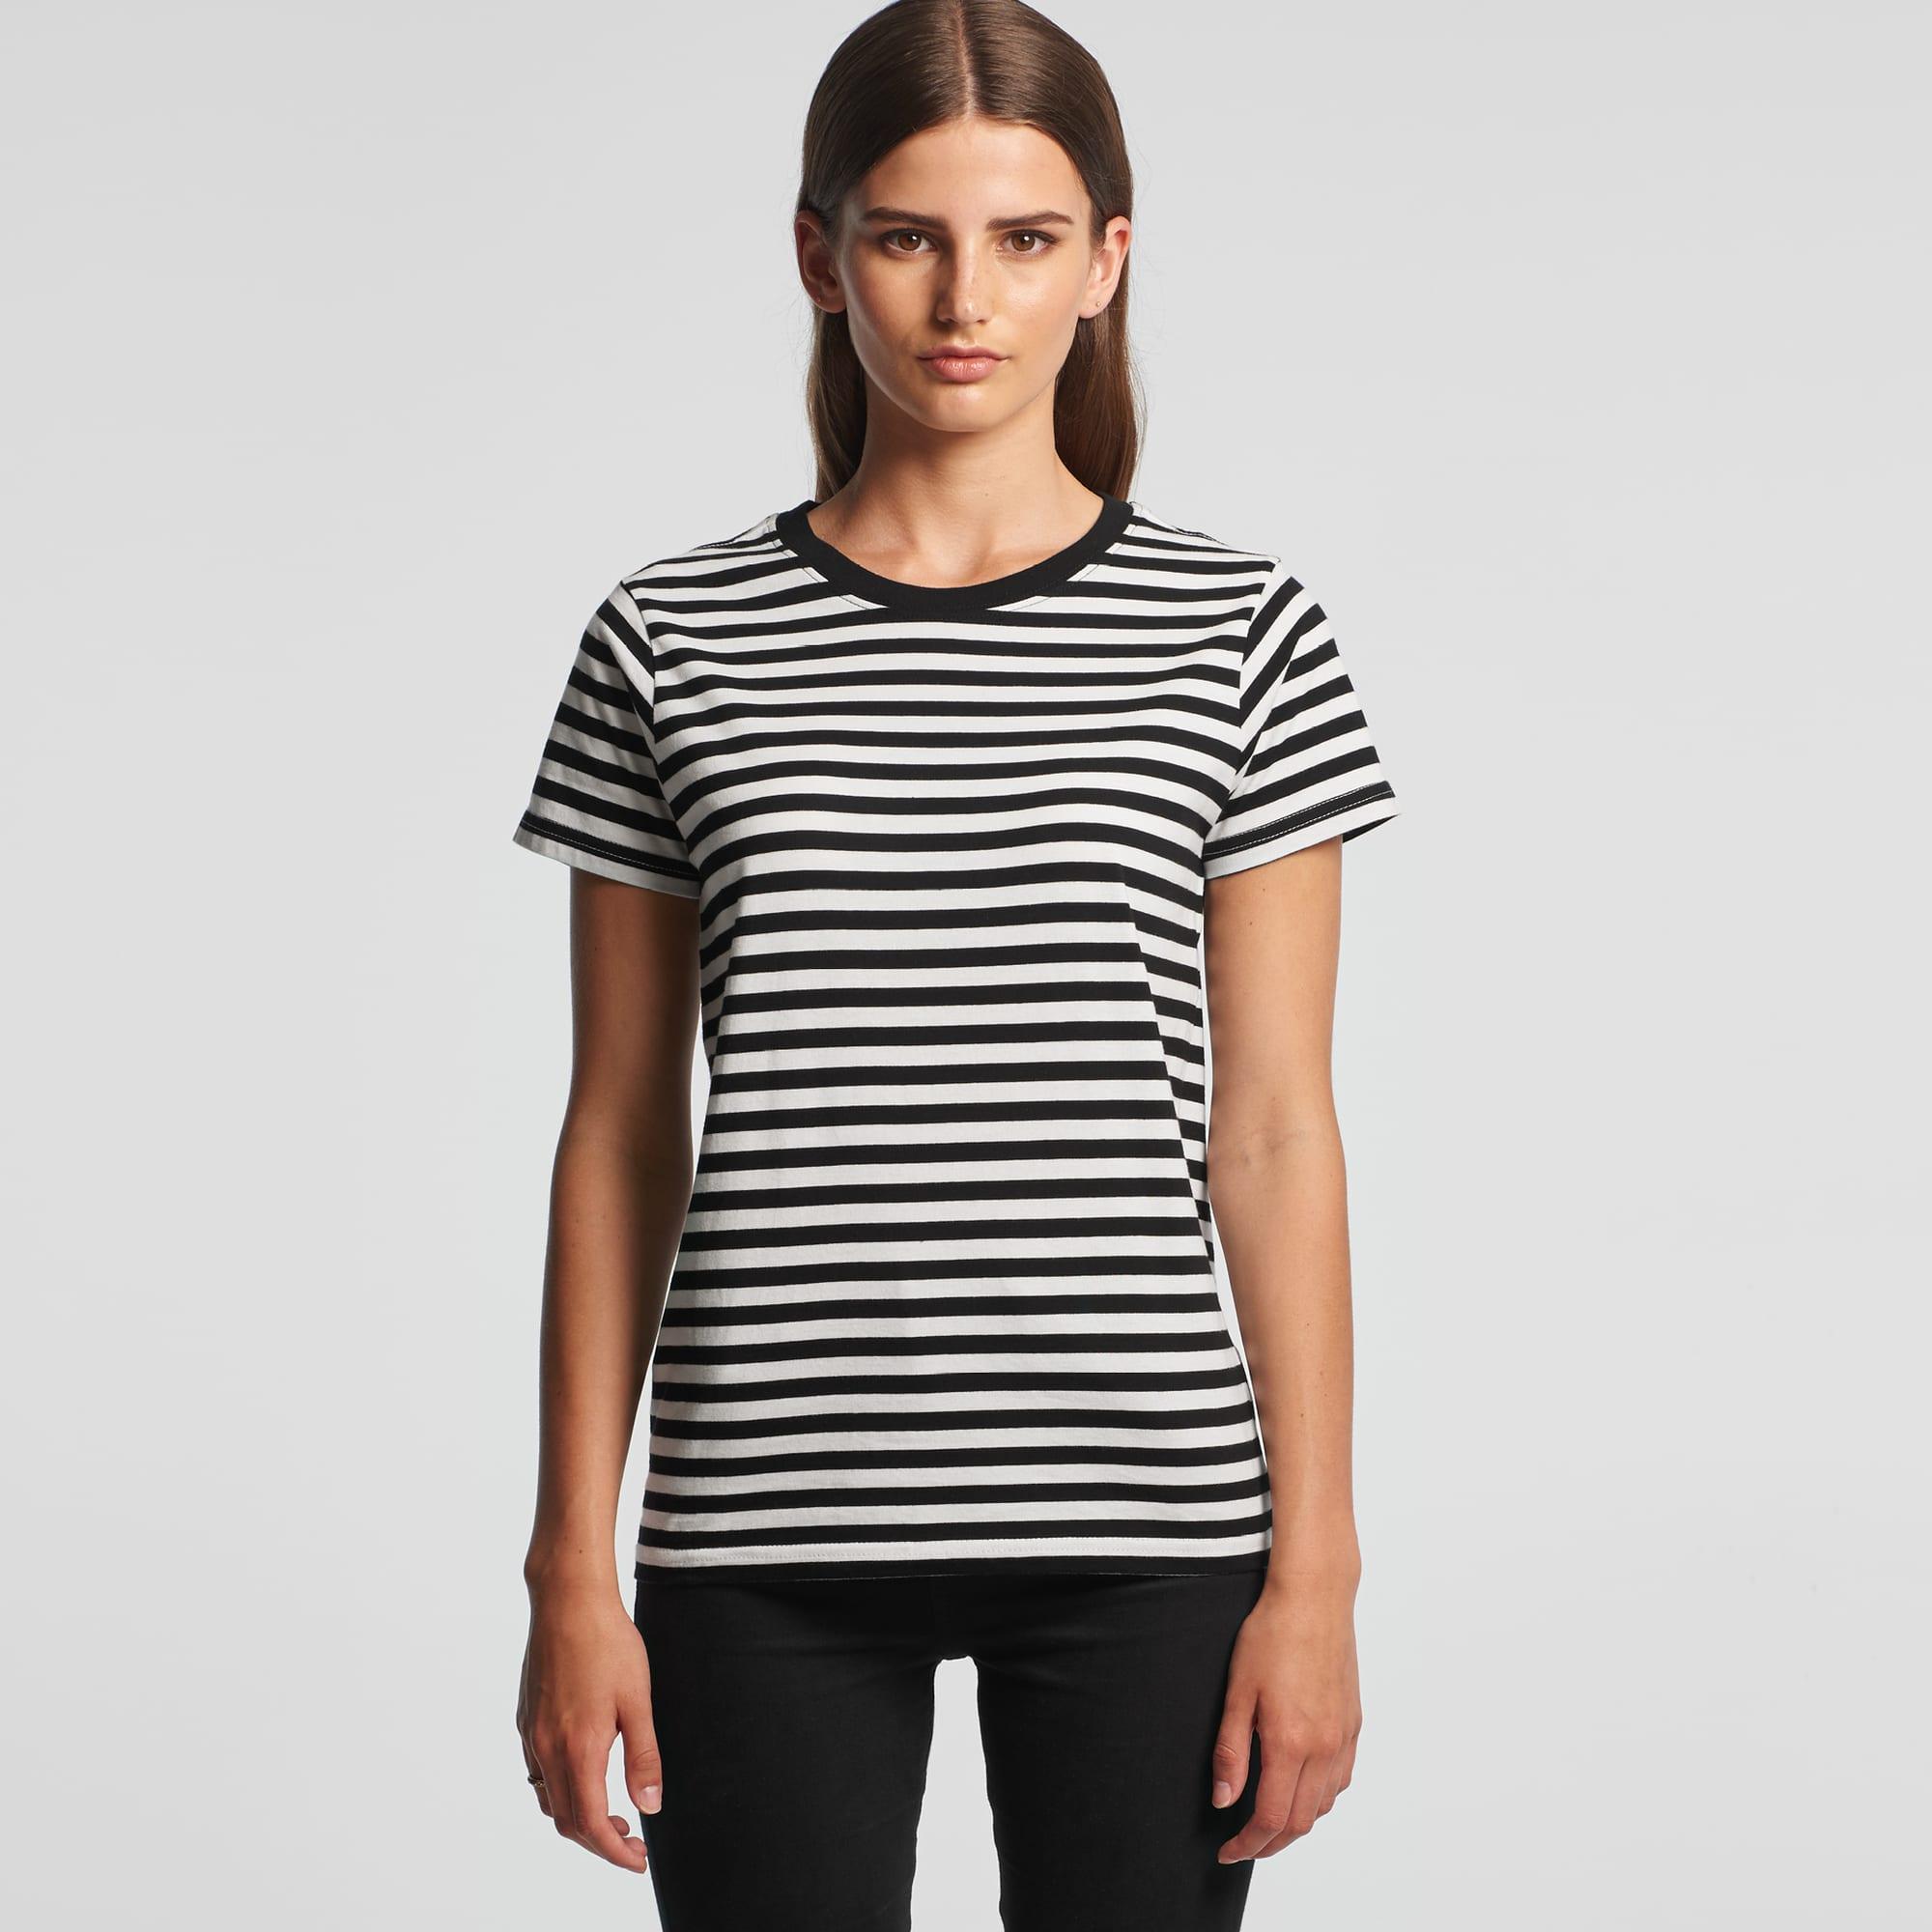 AS 4037 Womens Stripe Tee